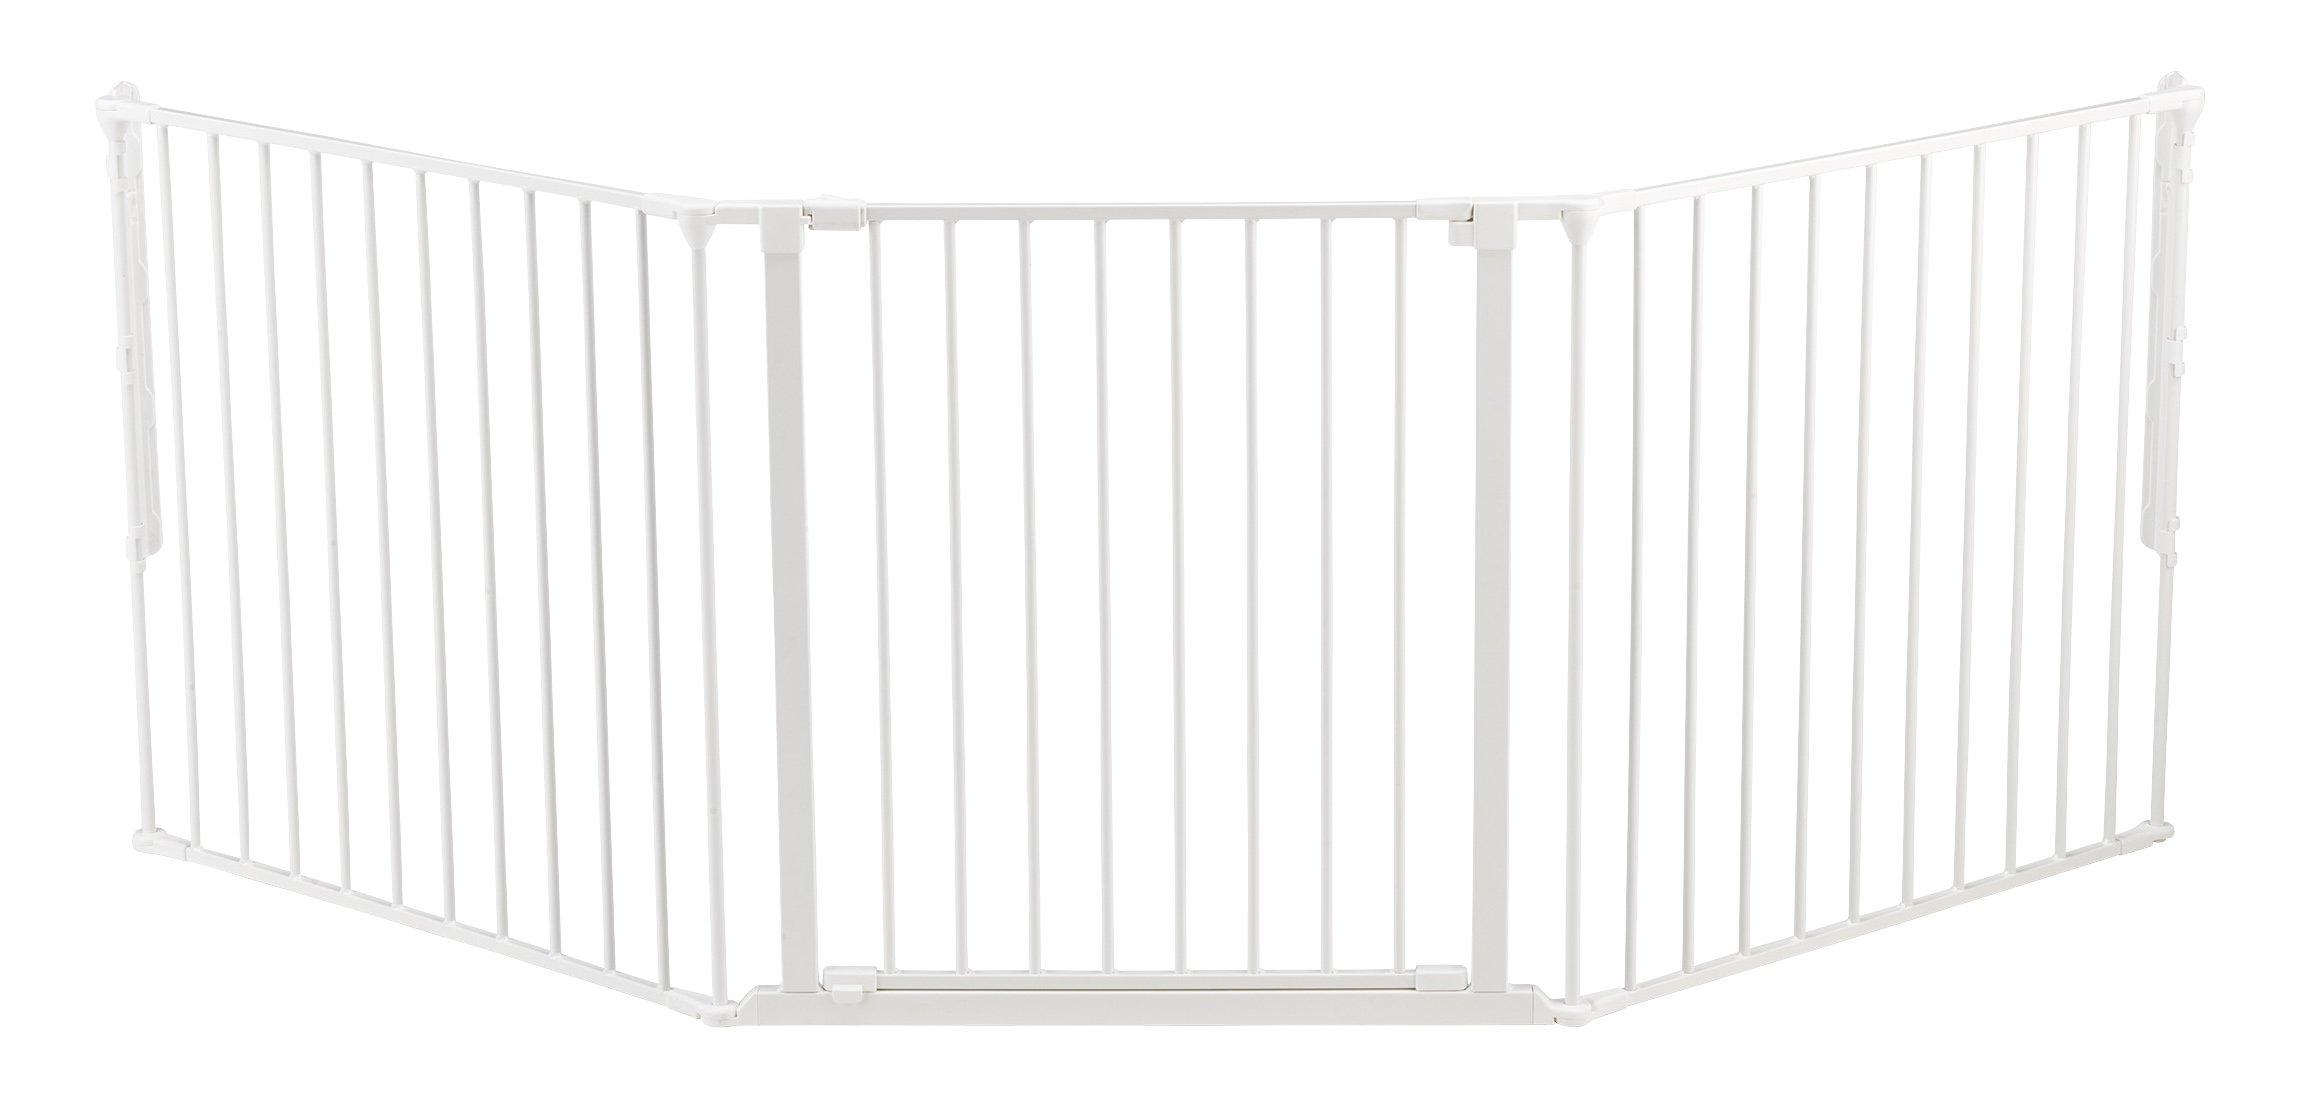 Baby Dan - Barrera de seguridad modulable flex l - blanco product image